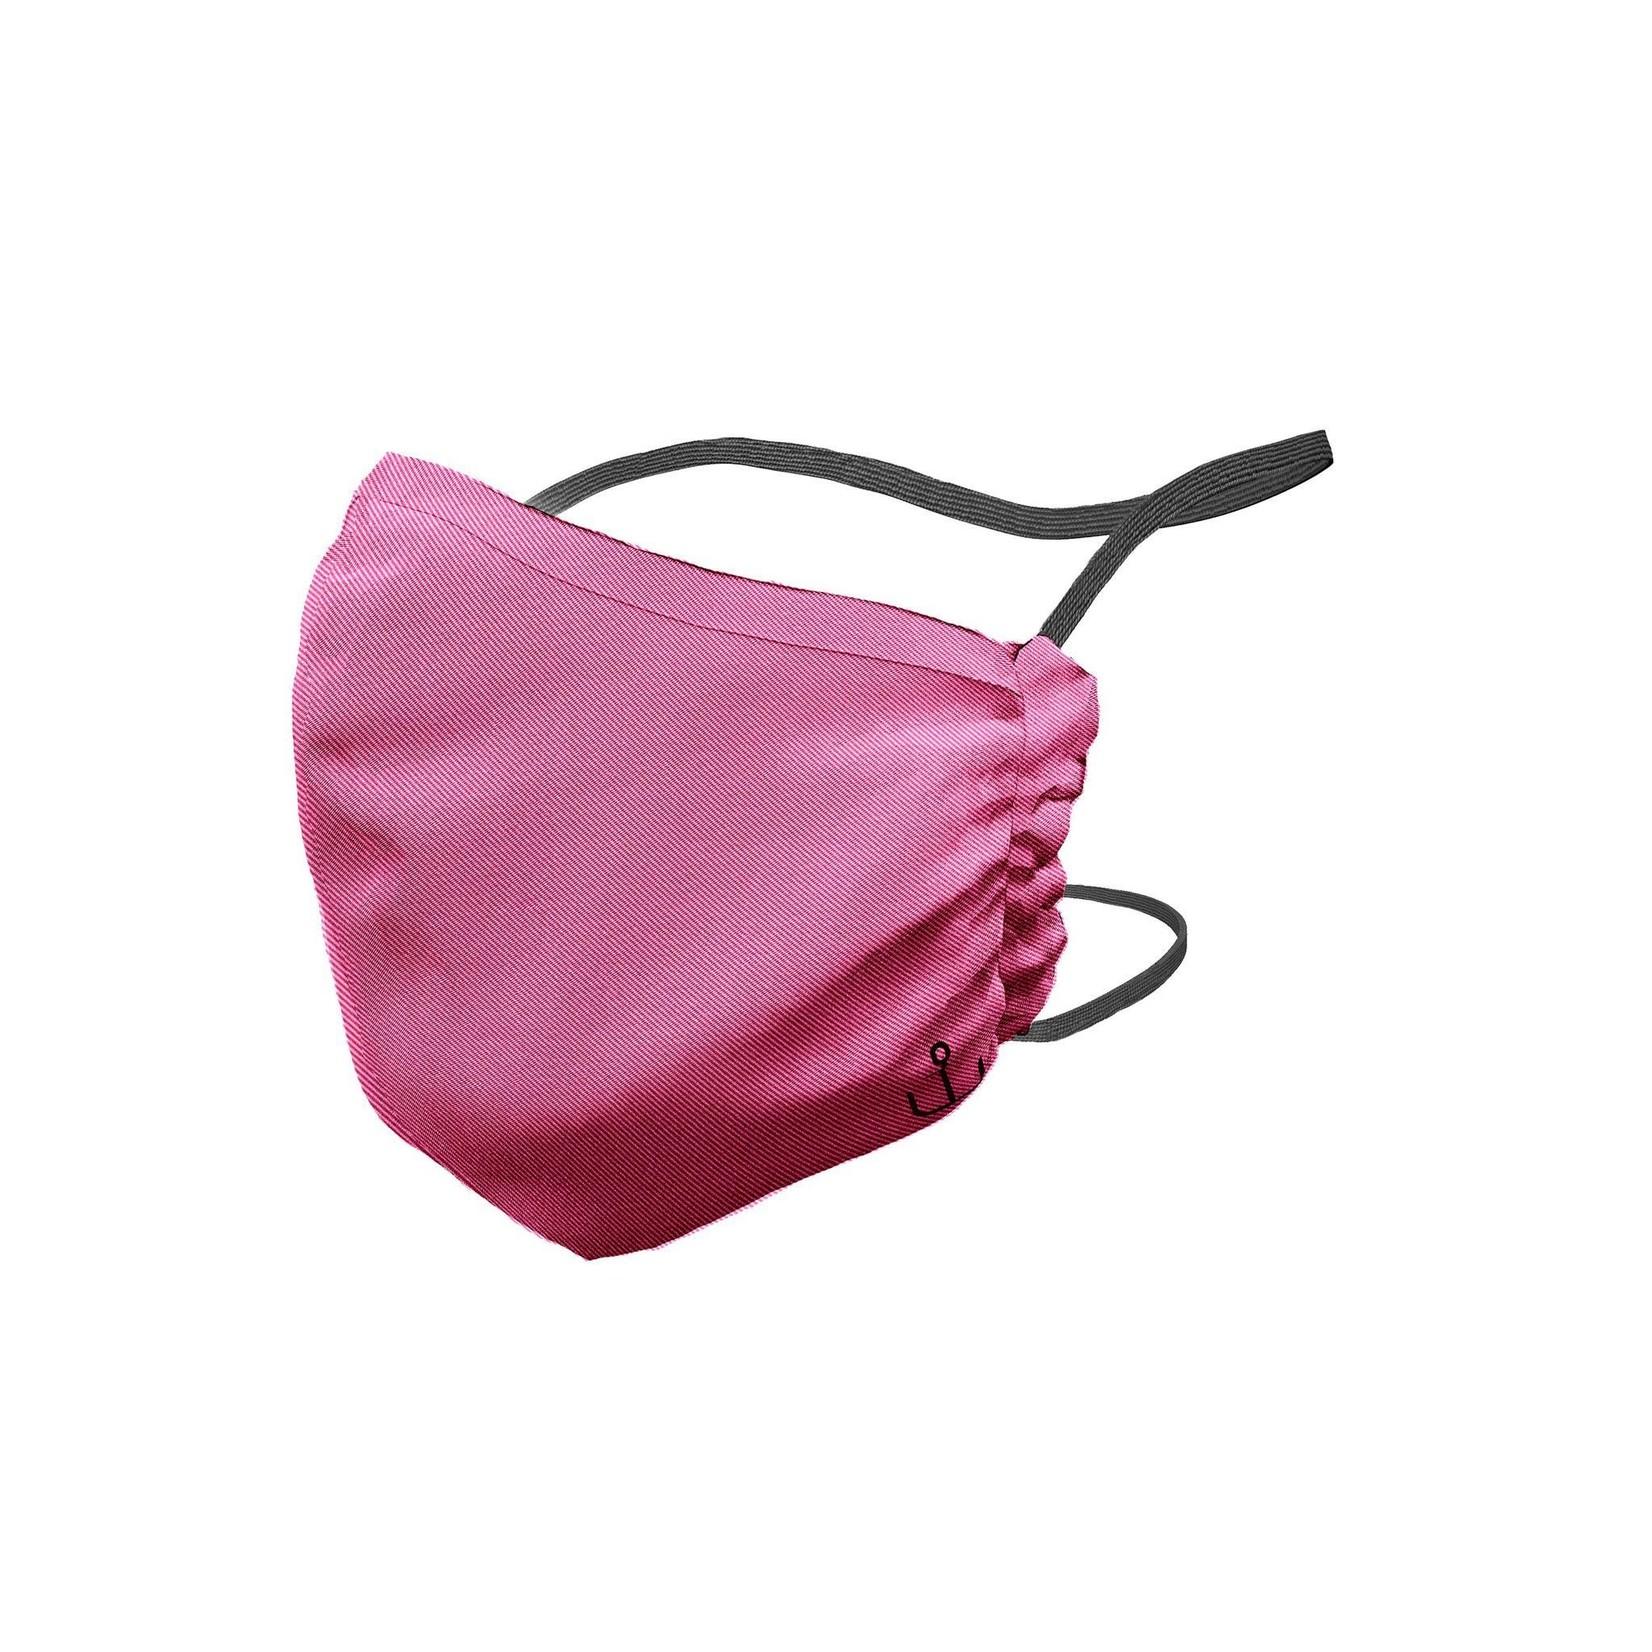 JCRT JCRT The Pink Twill Face Mask